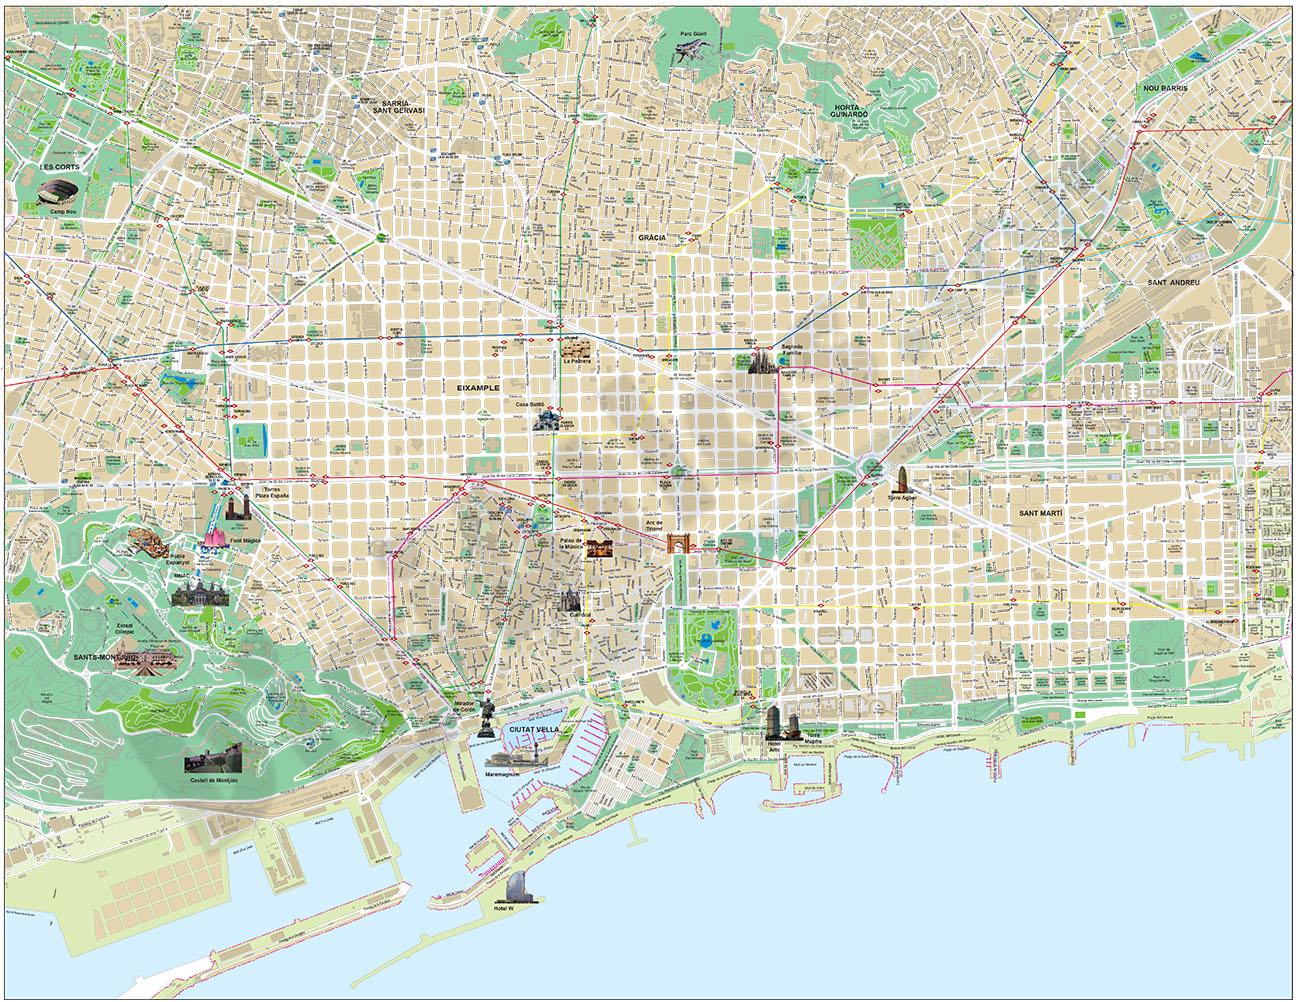 Barcelona - touristic city map